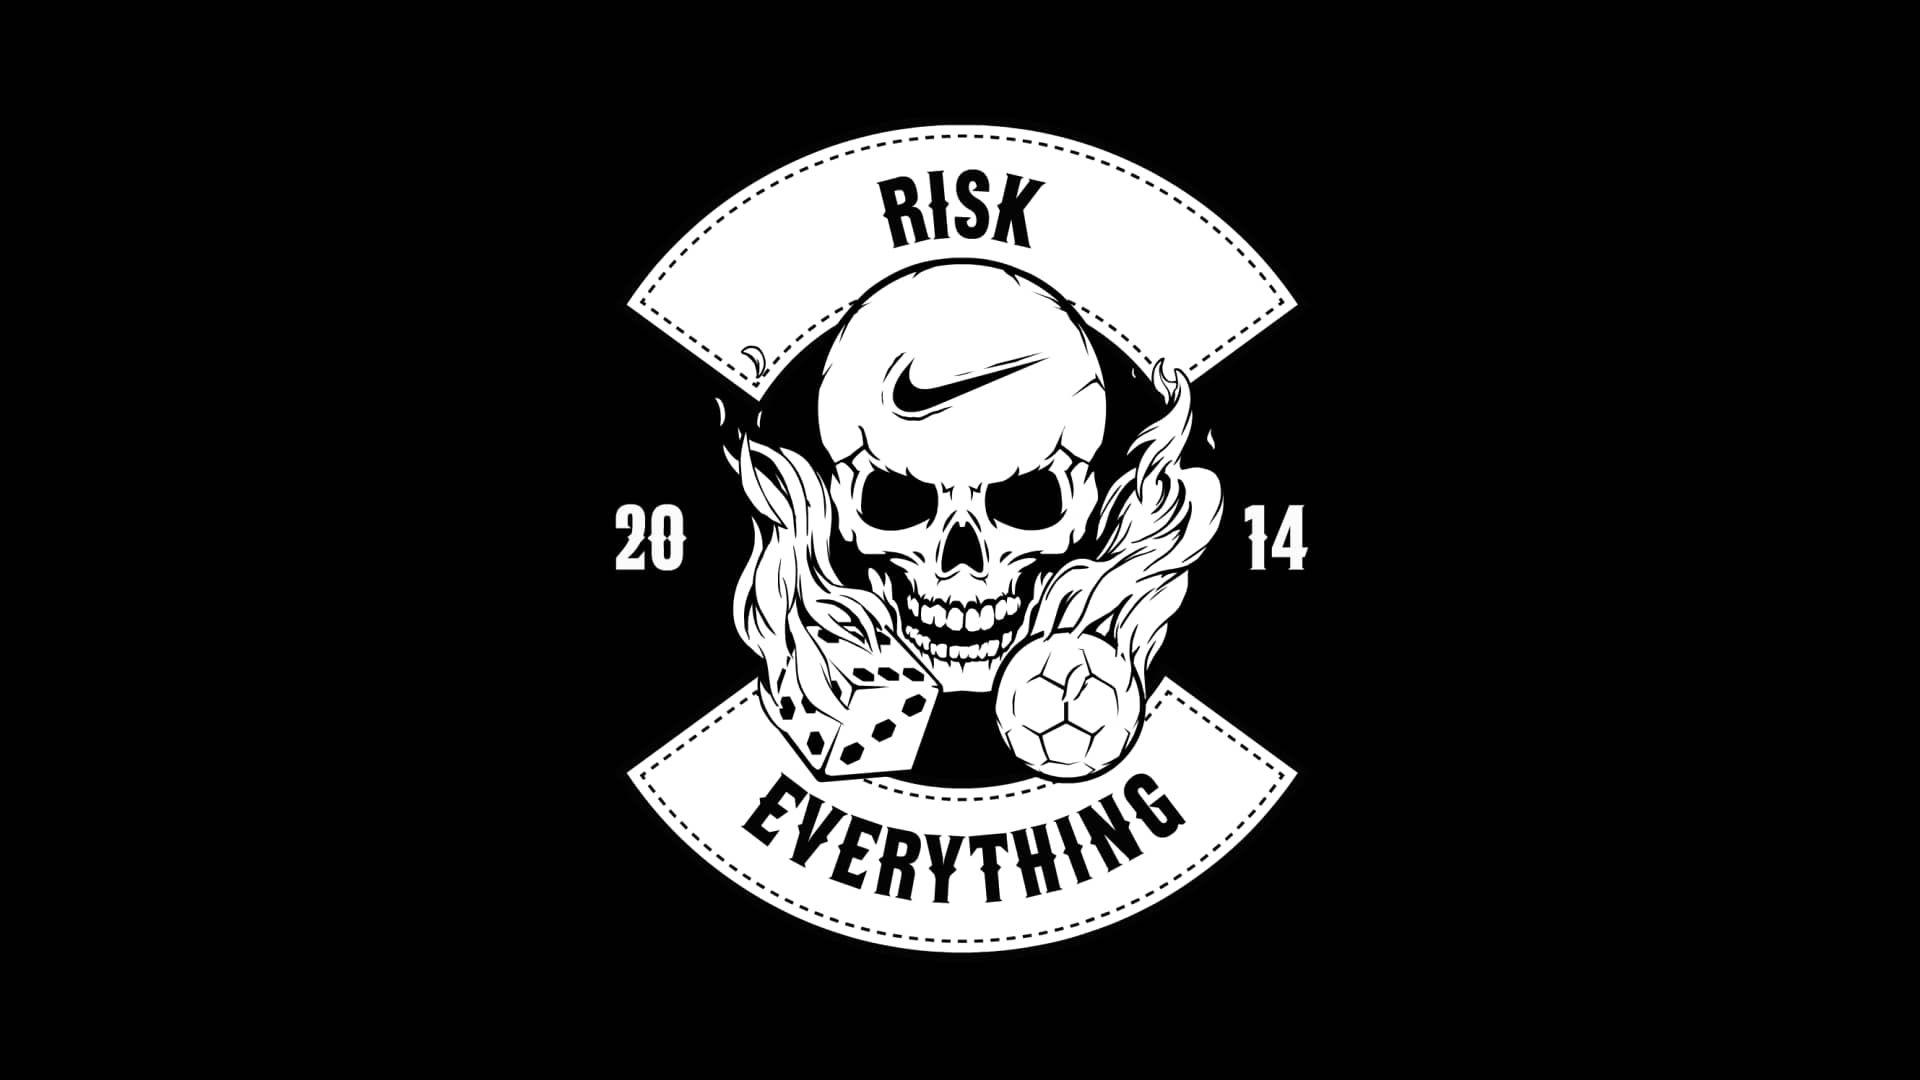 Repulsión medio litro trabajo  Nike Risk Everything | Nike football, Nike soccer, Animation